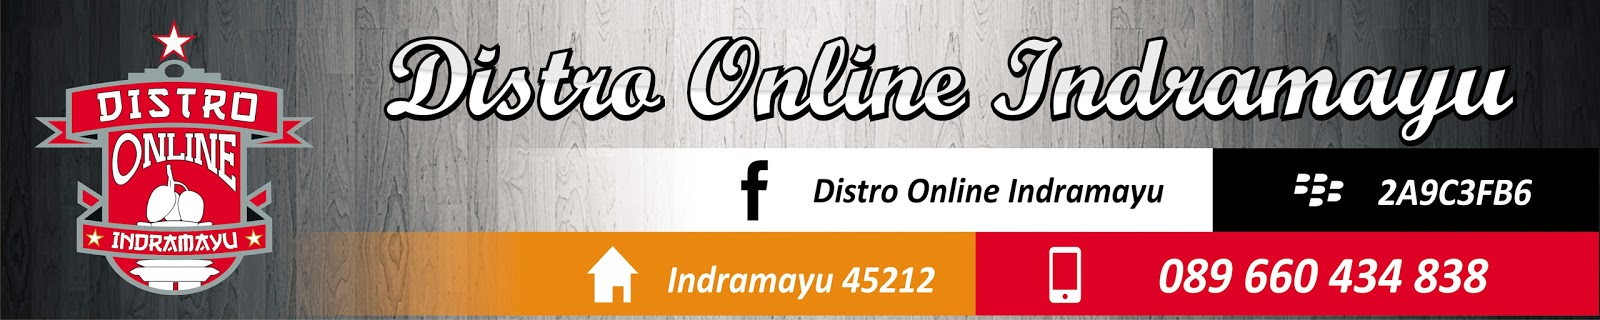 Distro Online Indramayu